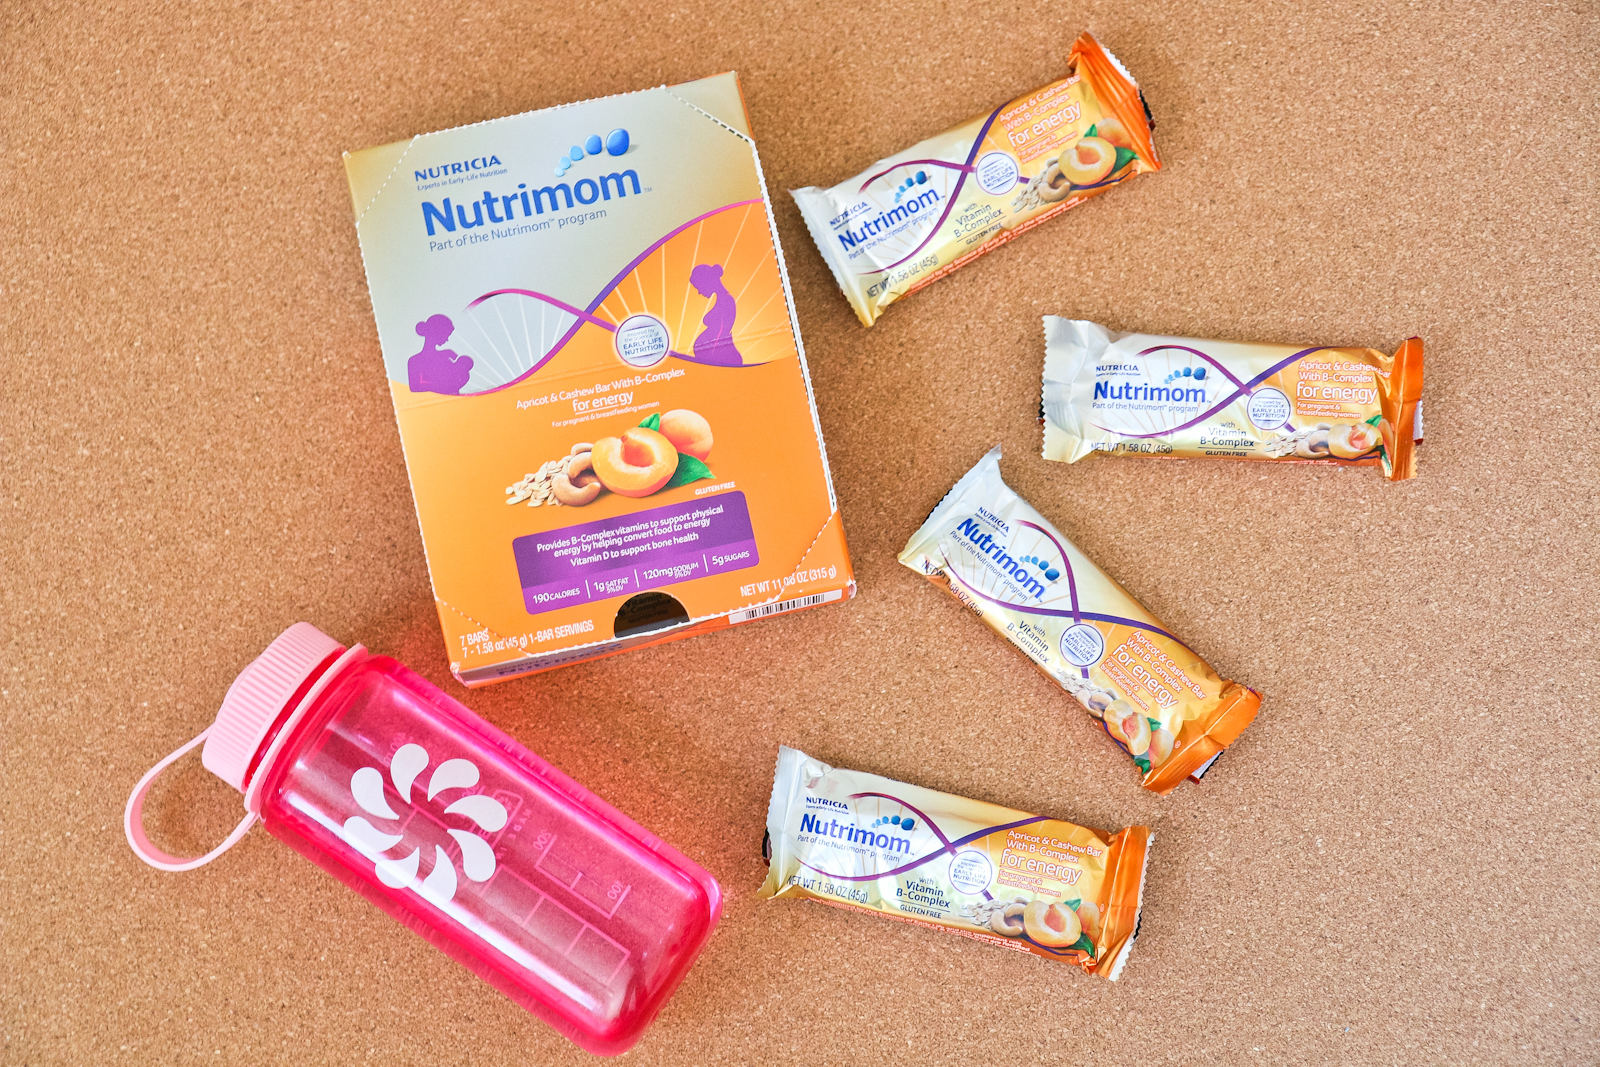 Nutrimom Energy Bars